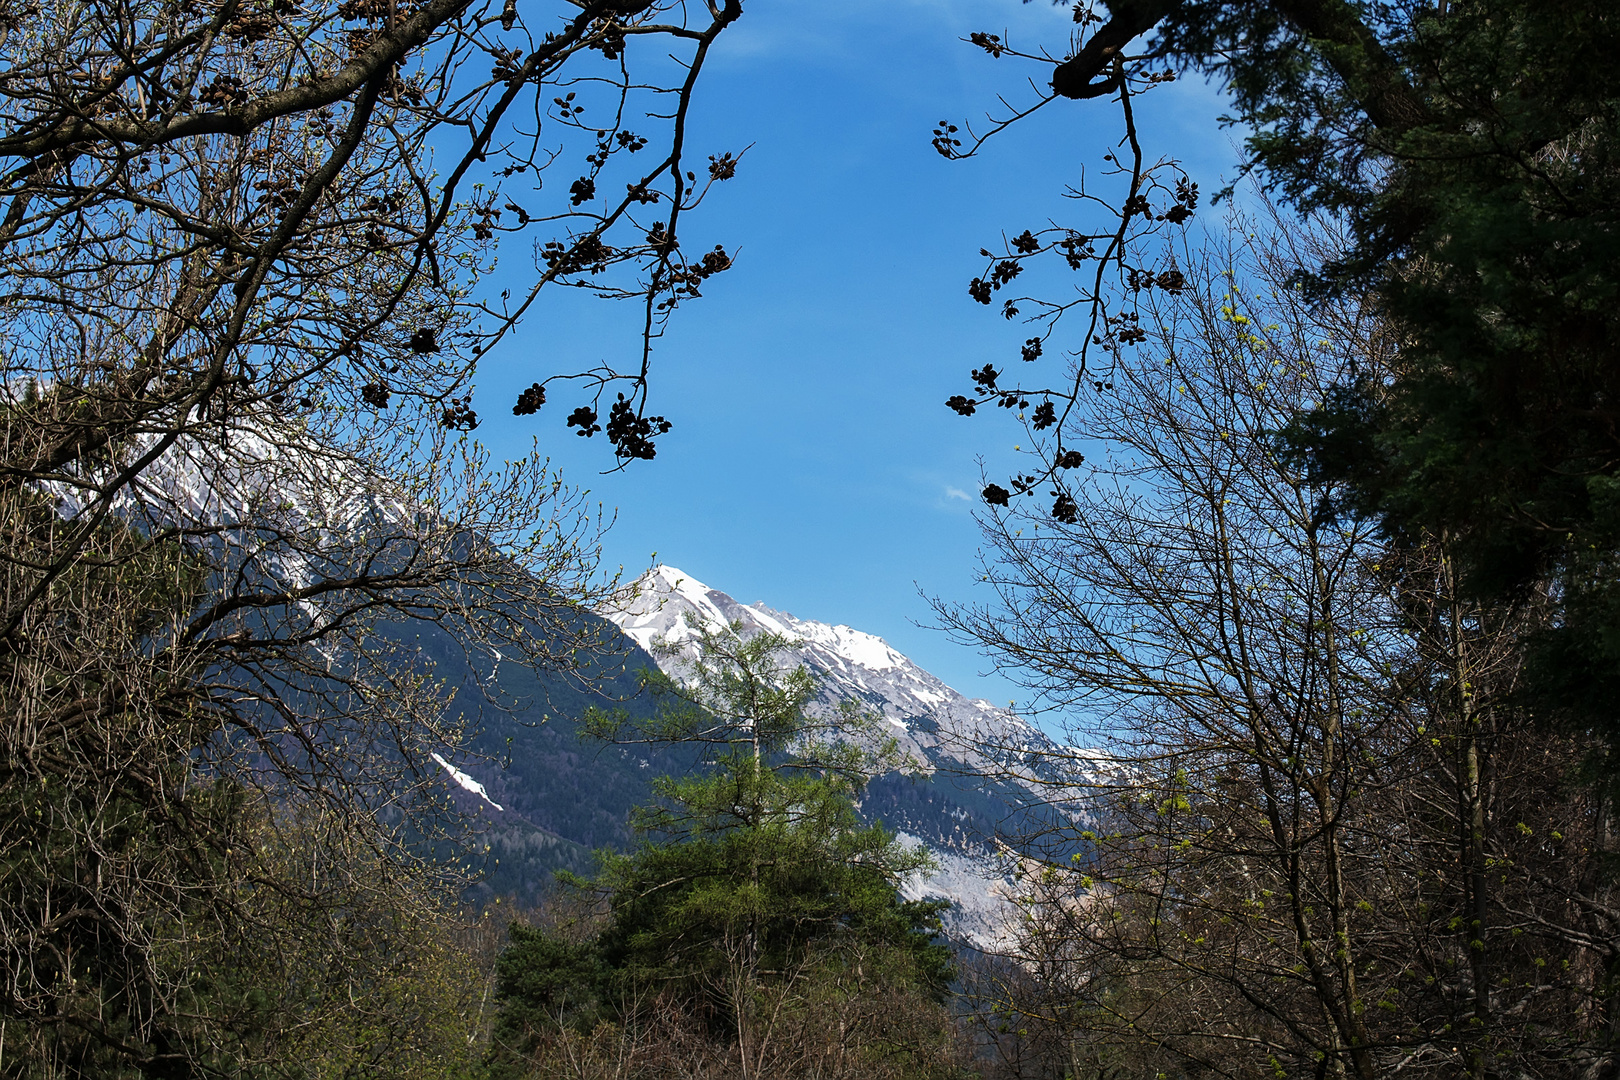 Pico nevado